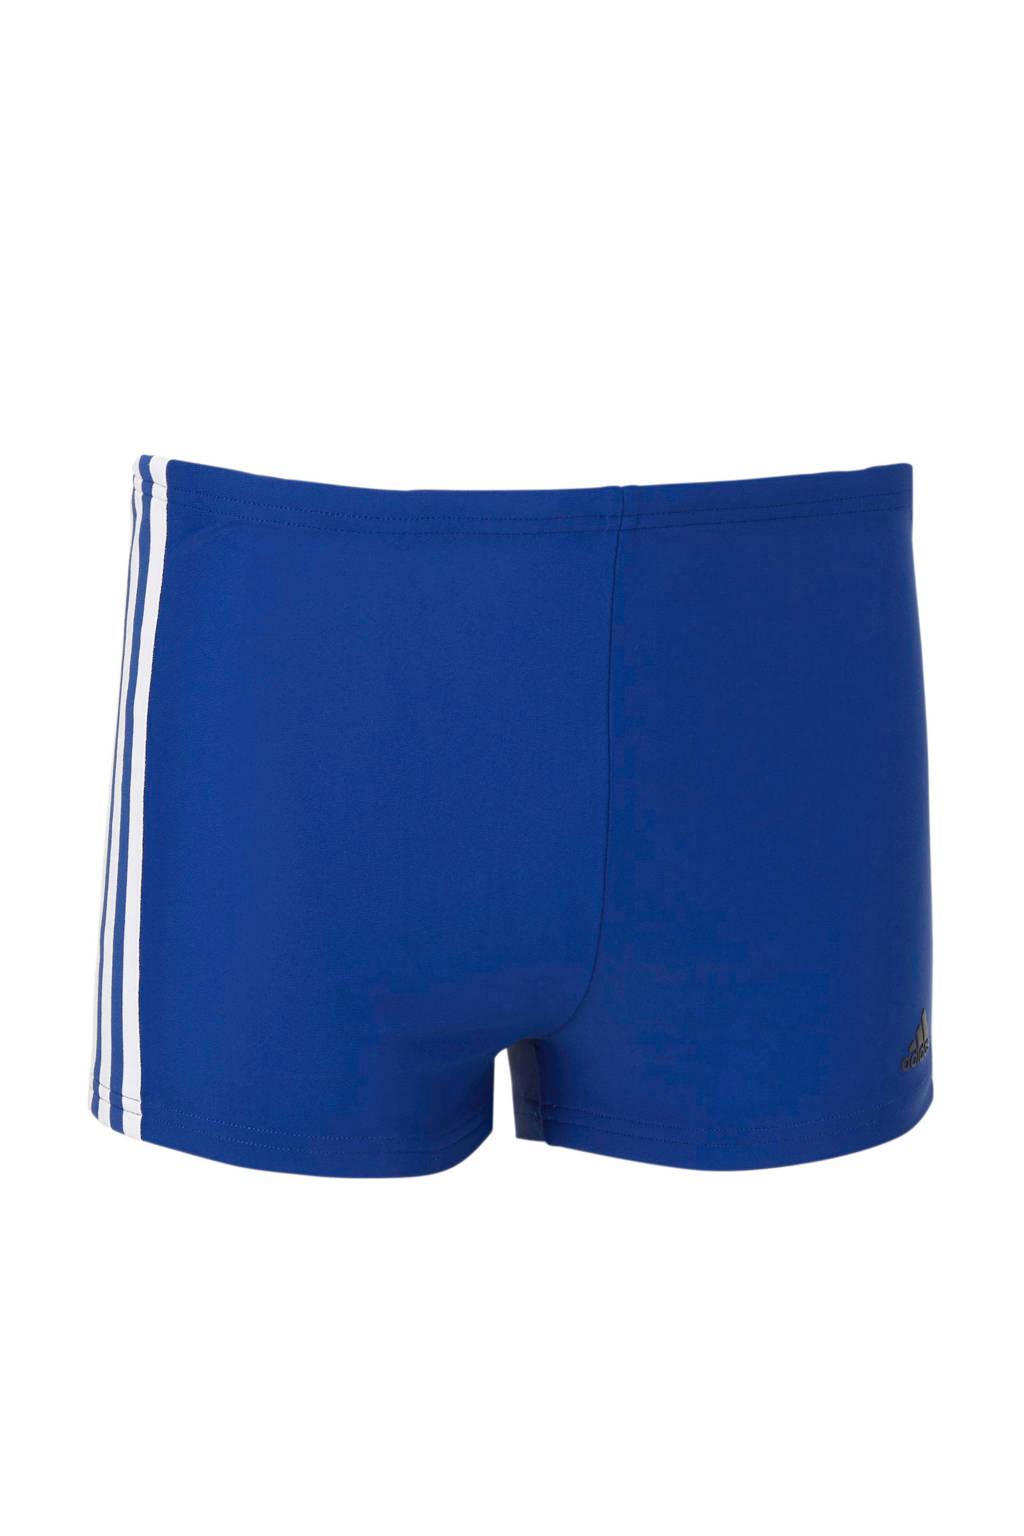 adidas infinitex zwemboxer 3-stripes blauw, Blauw